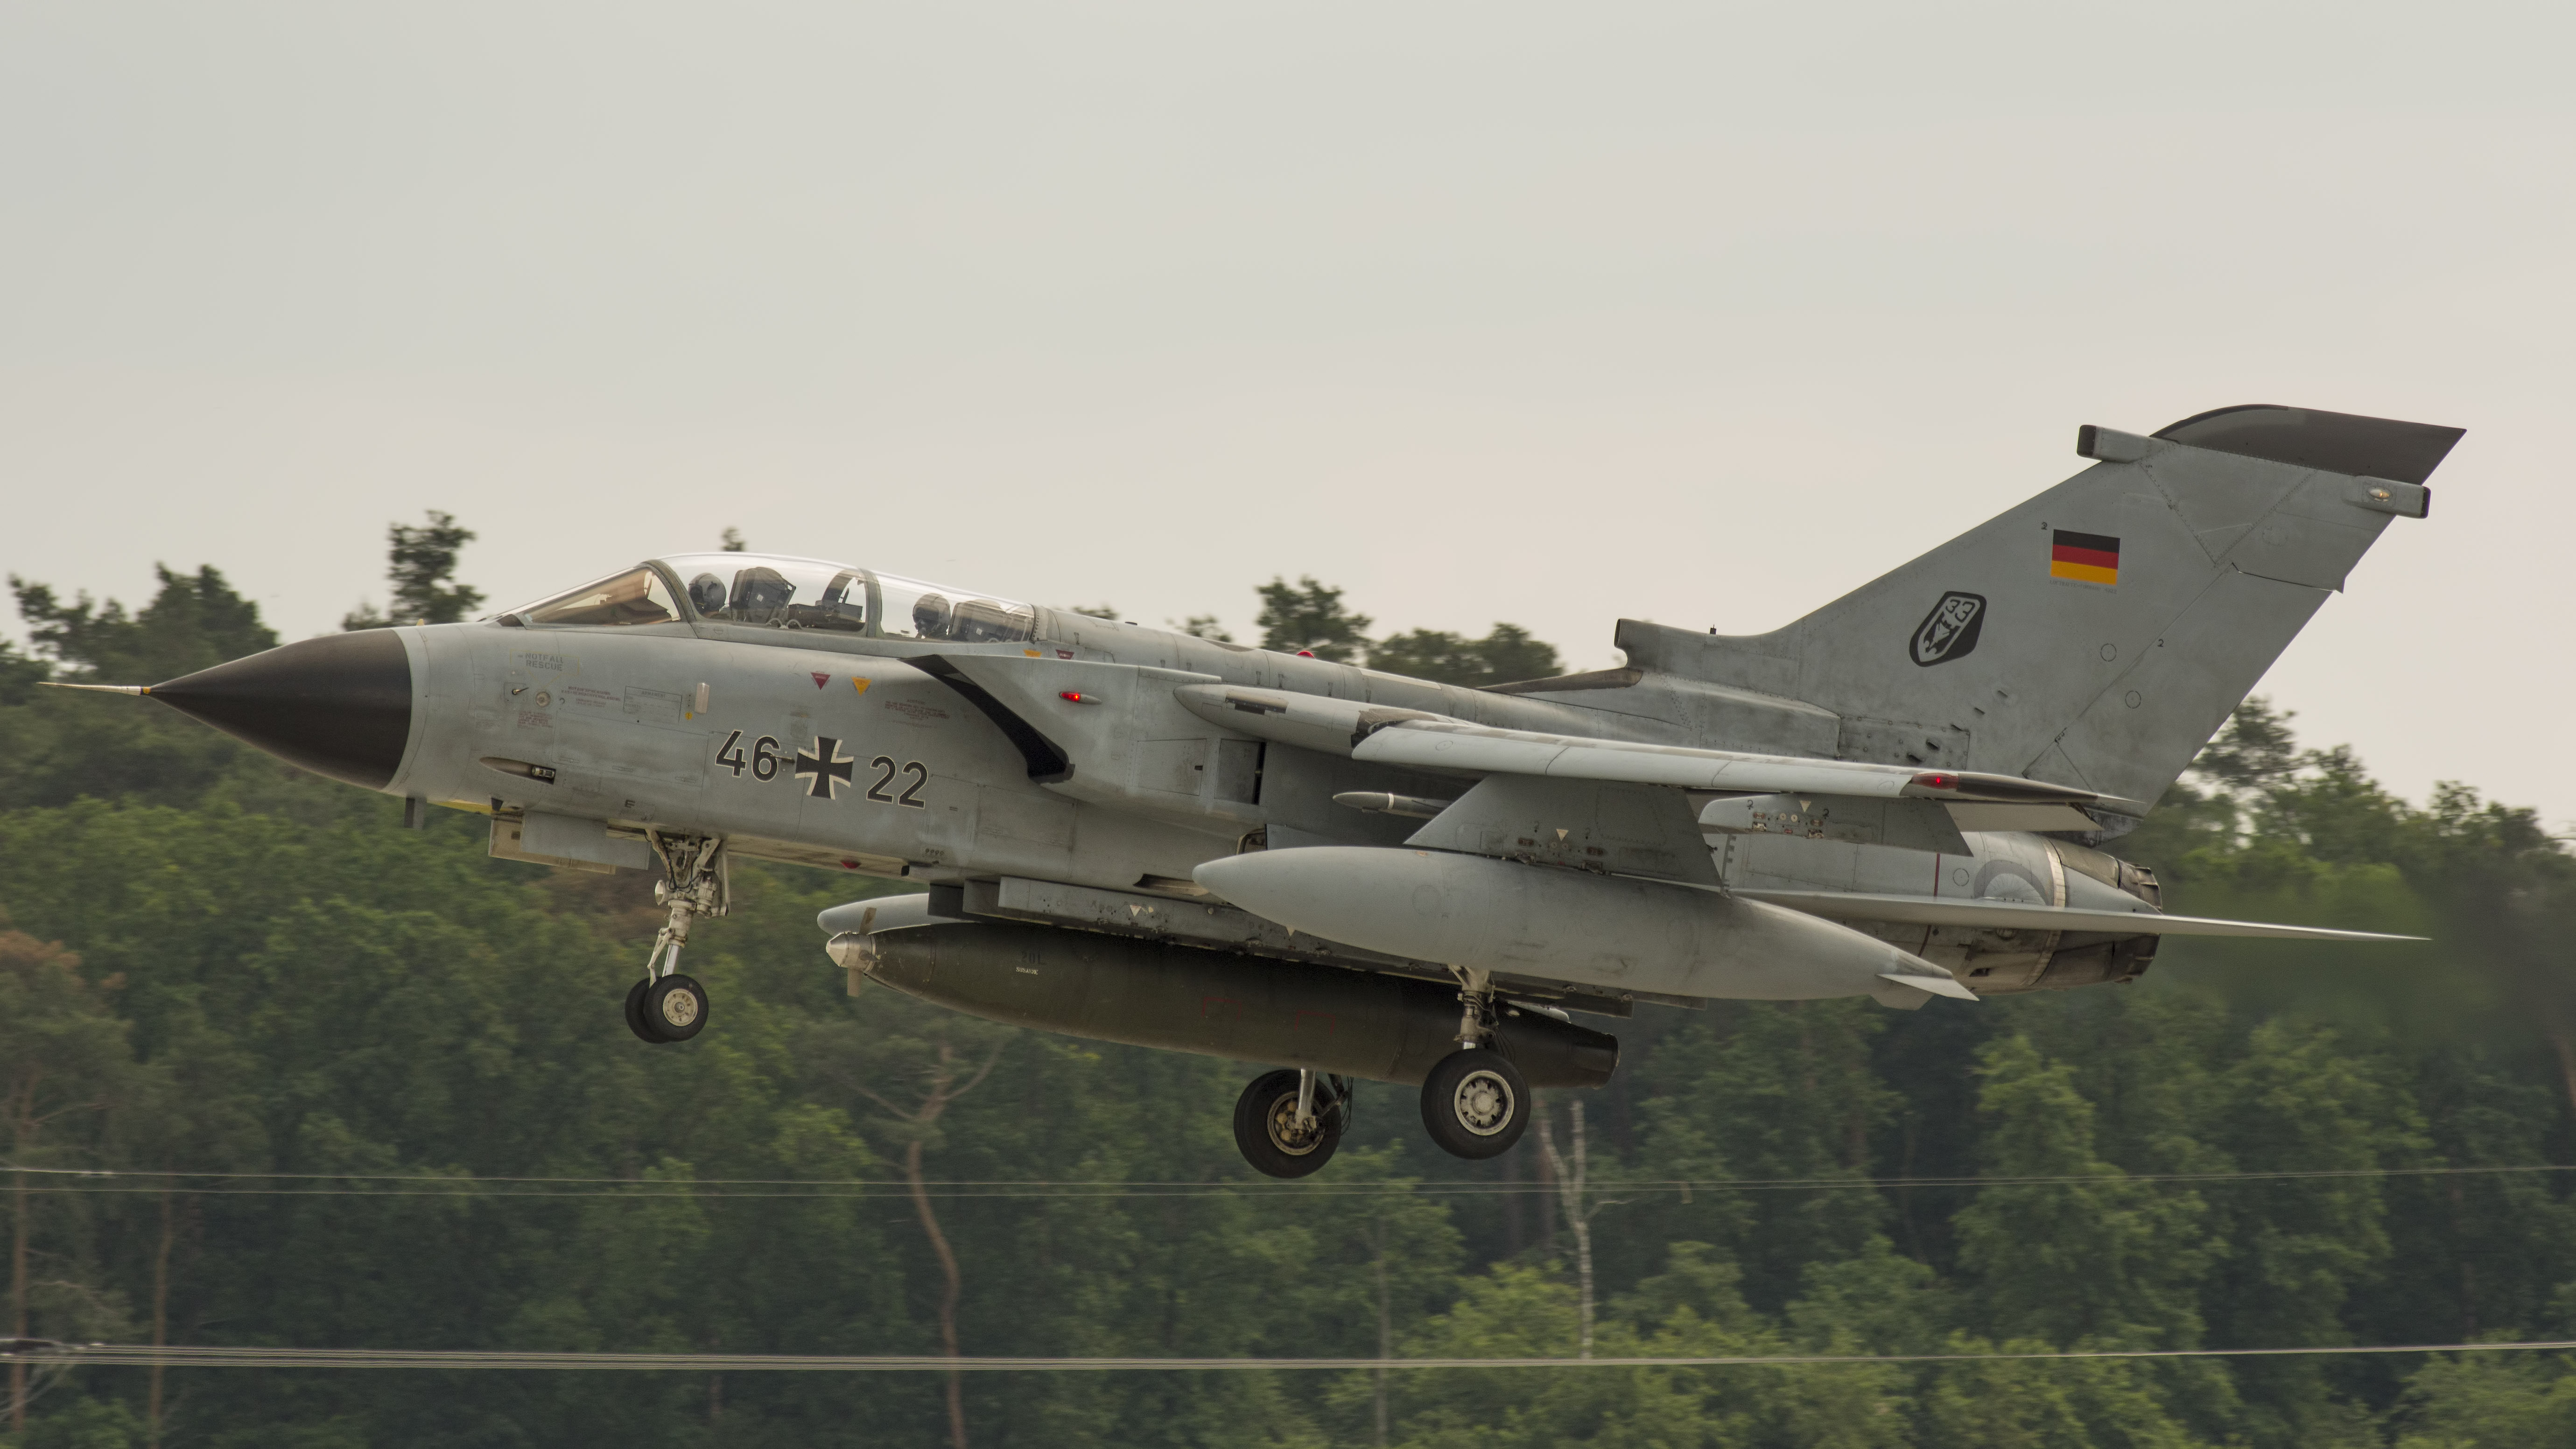 _IMG2664 Panavia Tornado IDS 46+22 German air force